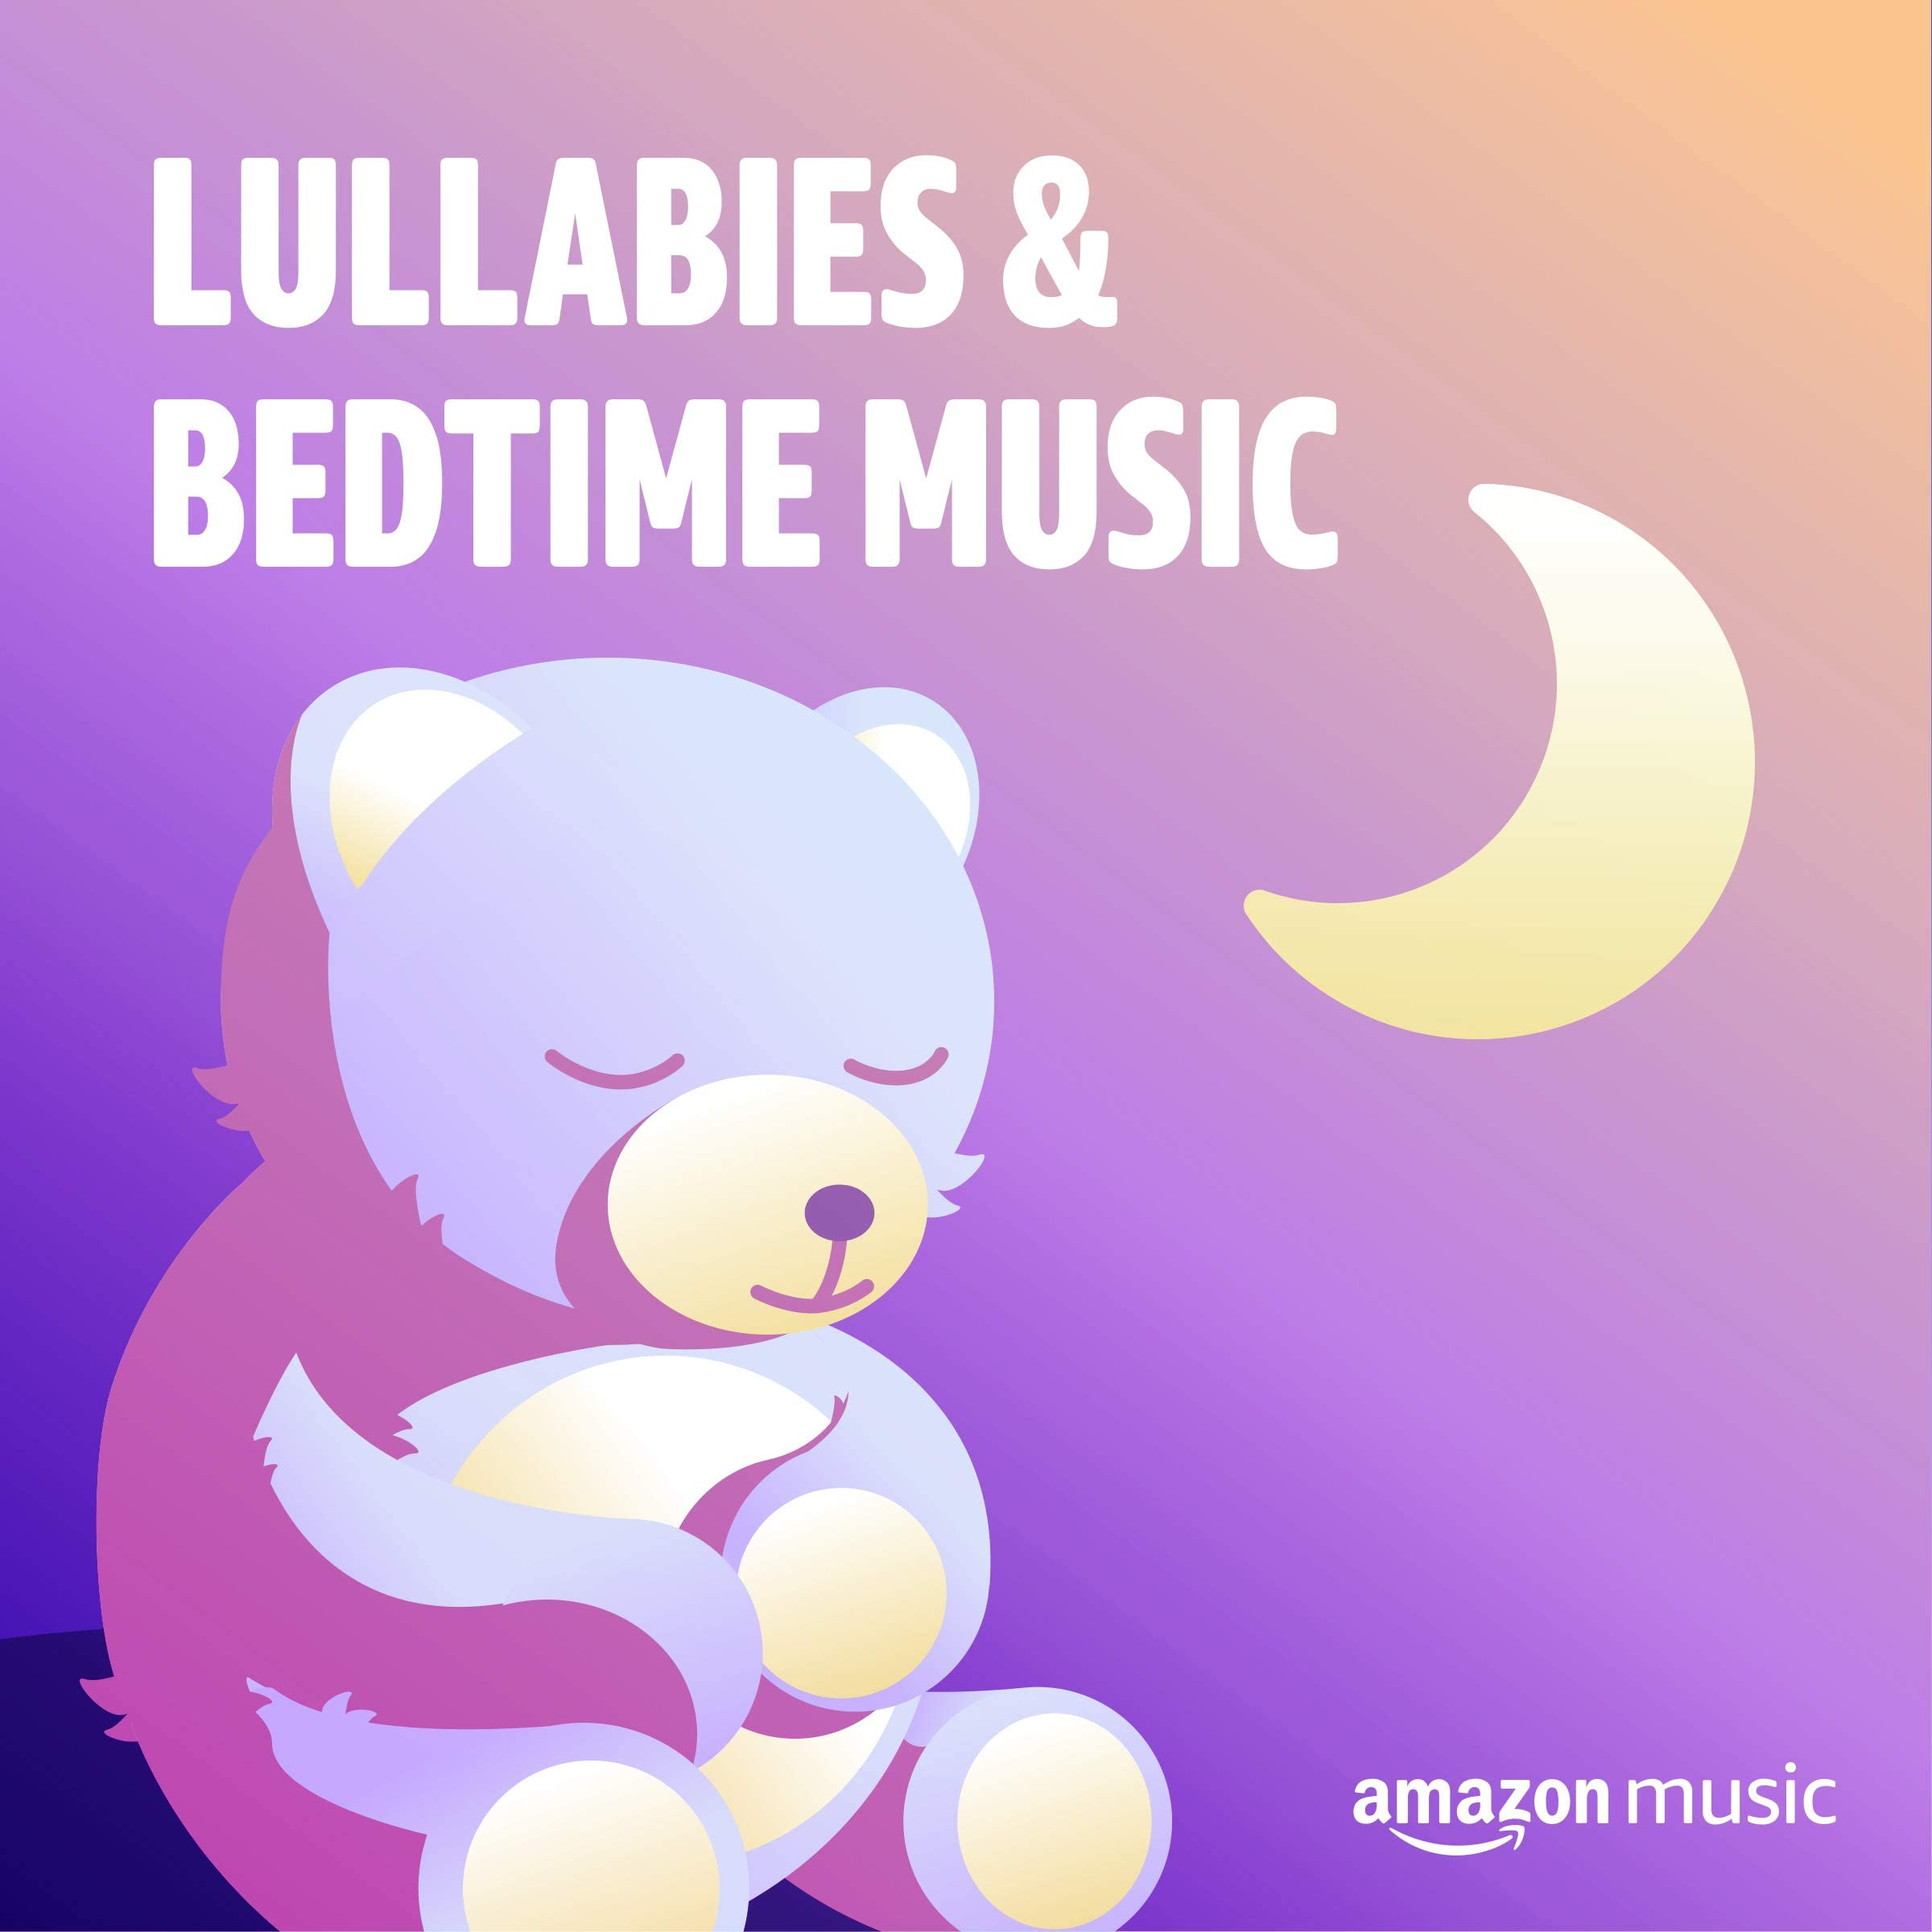 Lullabies & Bedtime Music